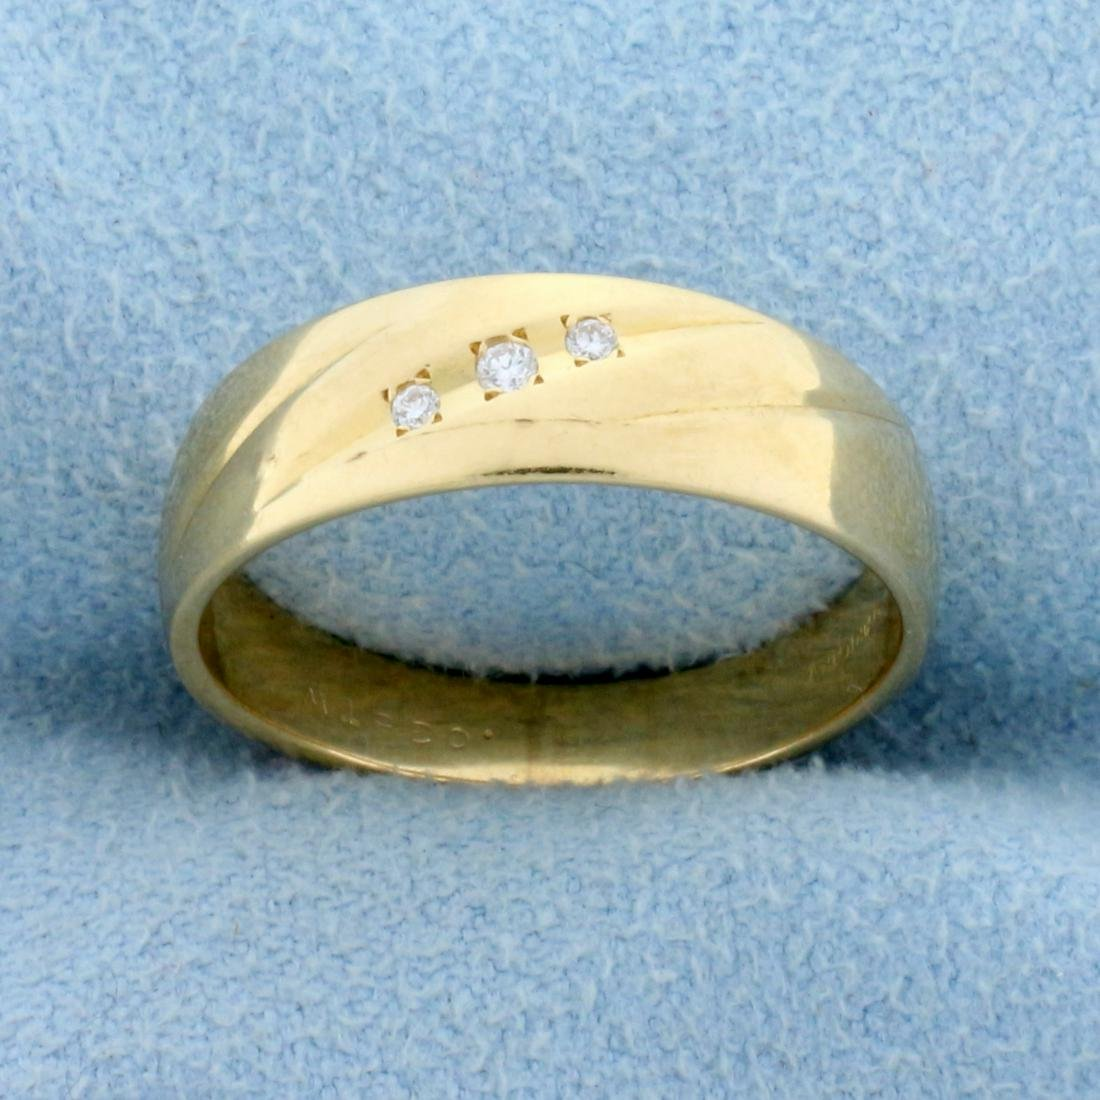 3-Stone Diamond Wedding or Anniversary Band Ring in 14K